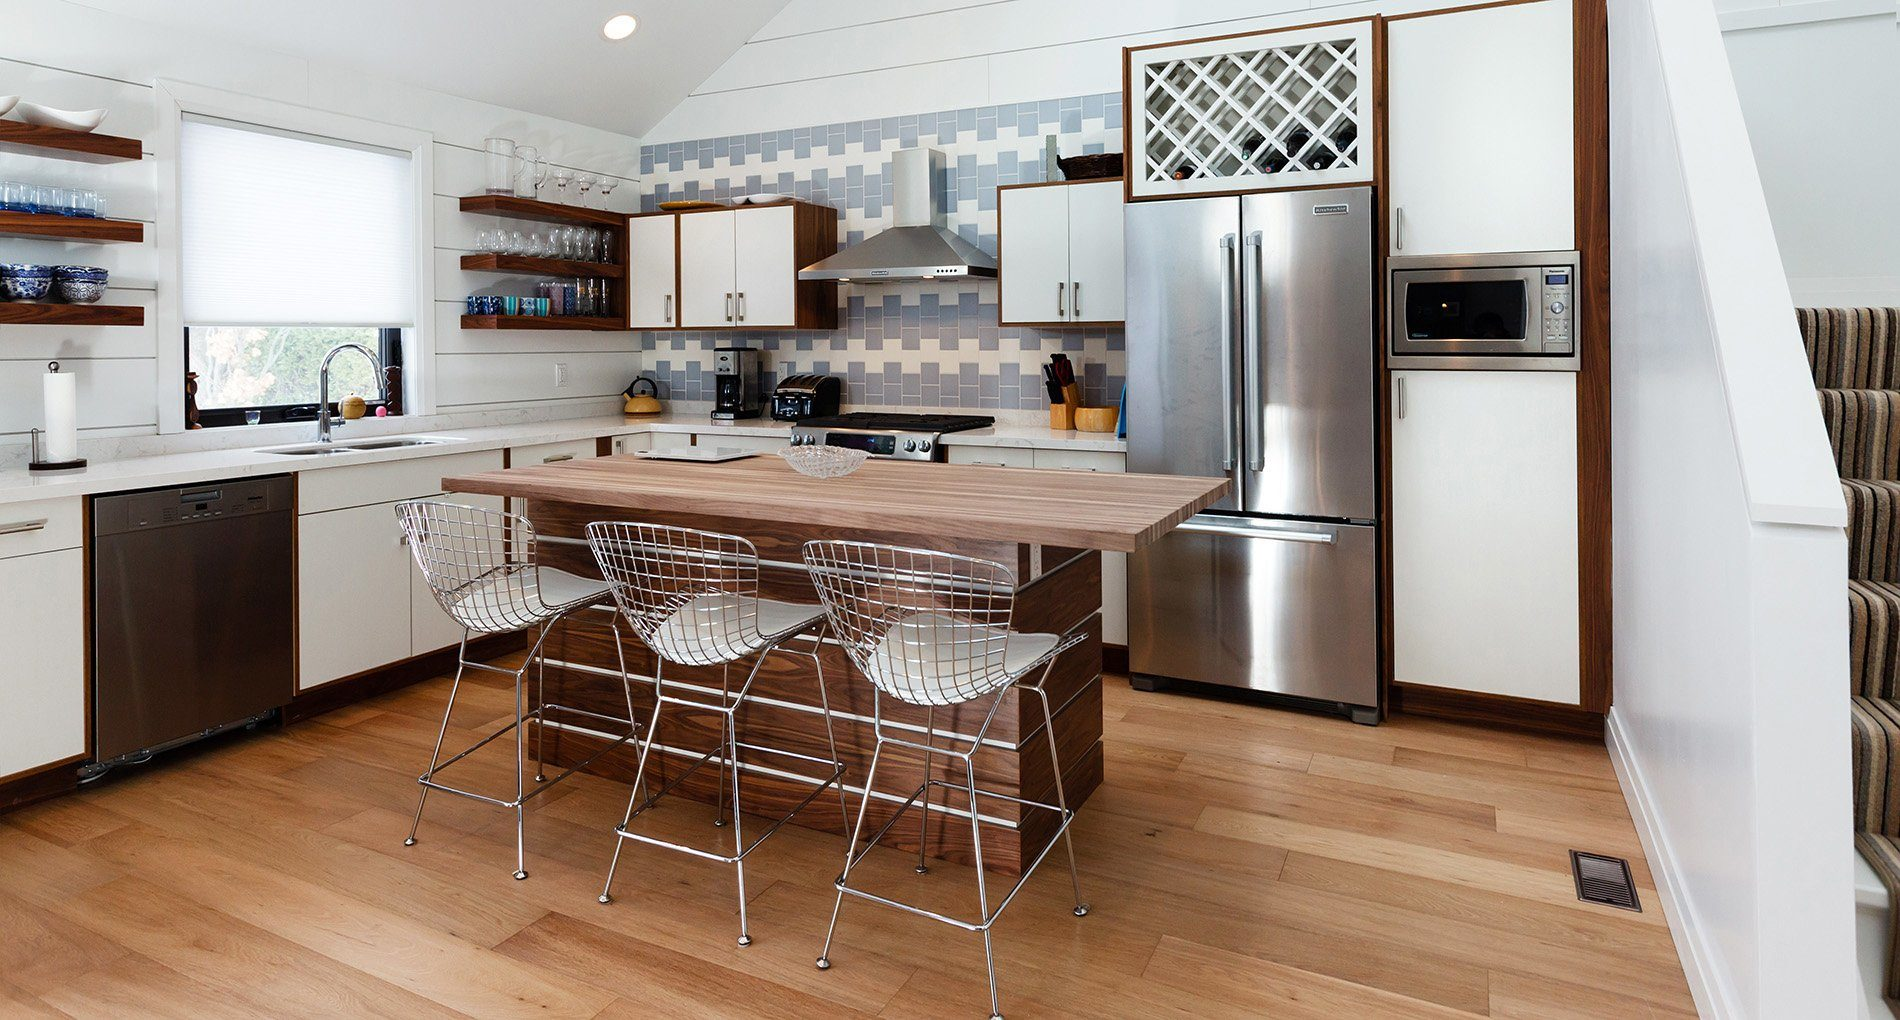 kitchen renovations design in surrey central alair homes surrey